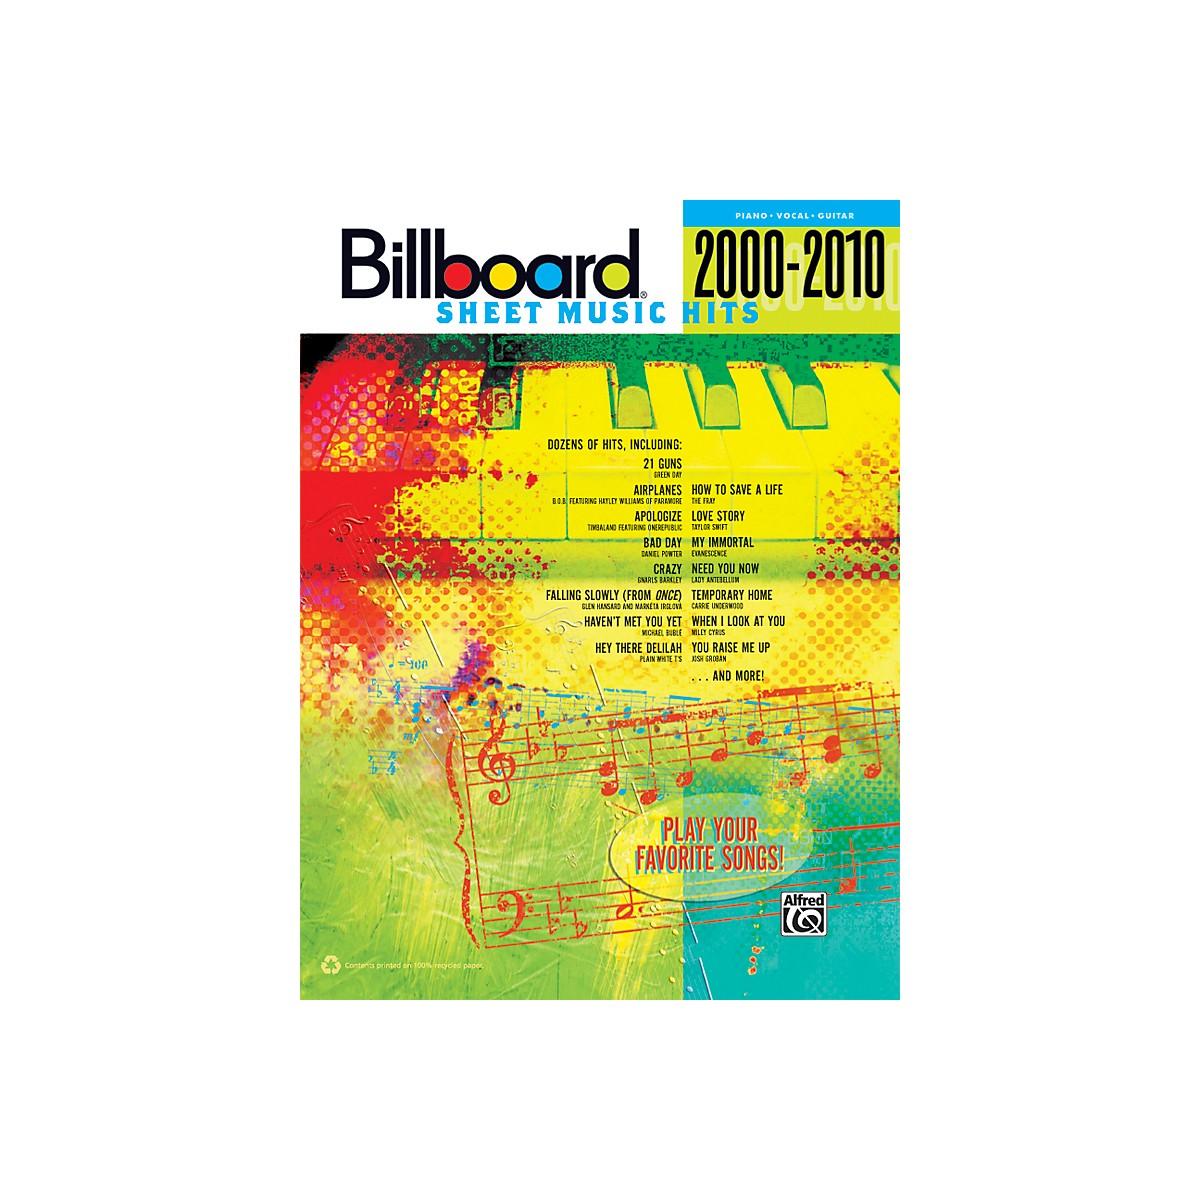 Alfred Billboard Sheet Music Hits 20002010 PVC